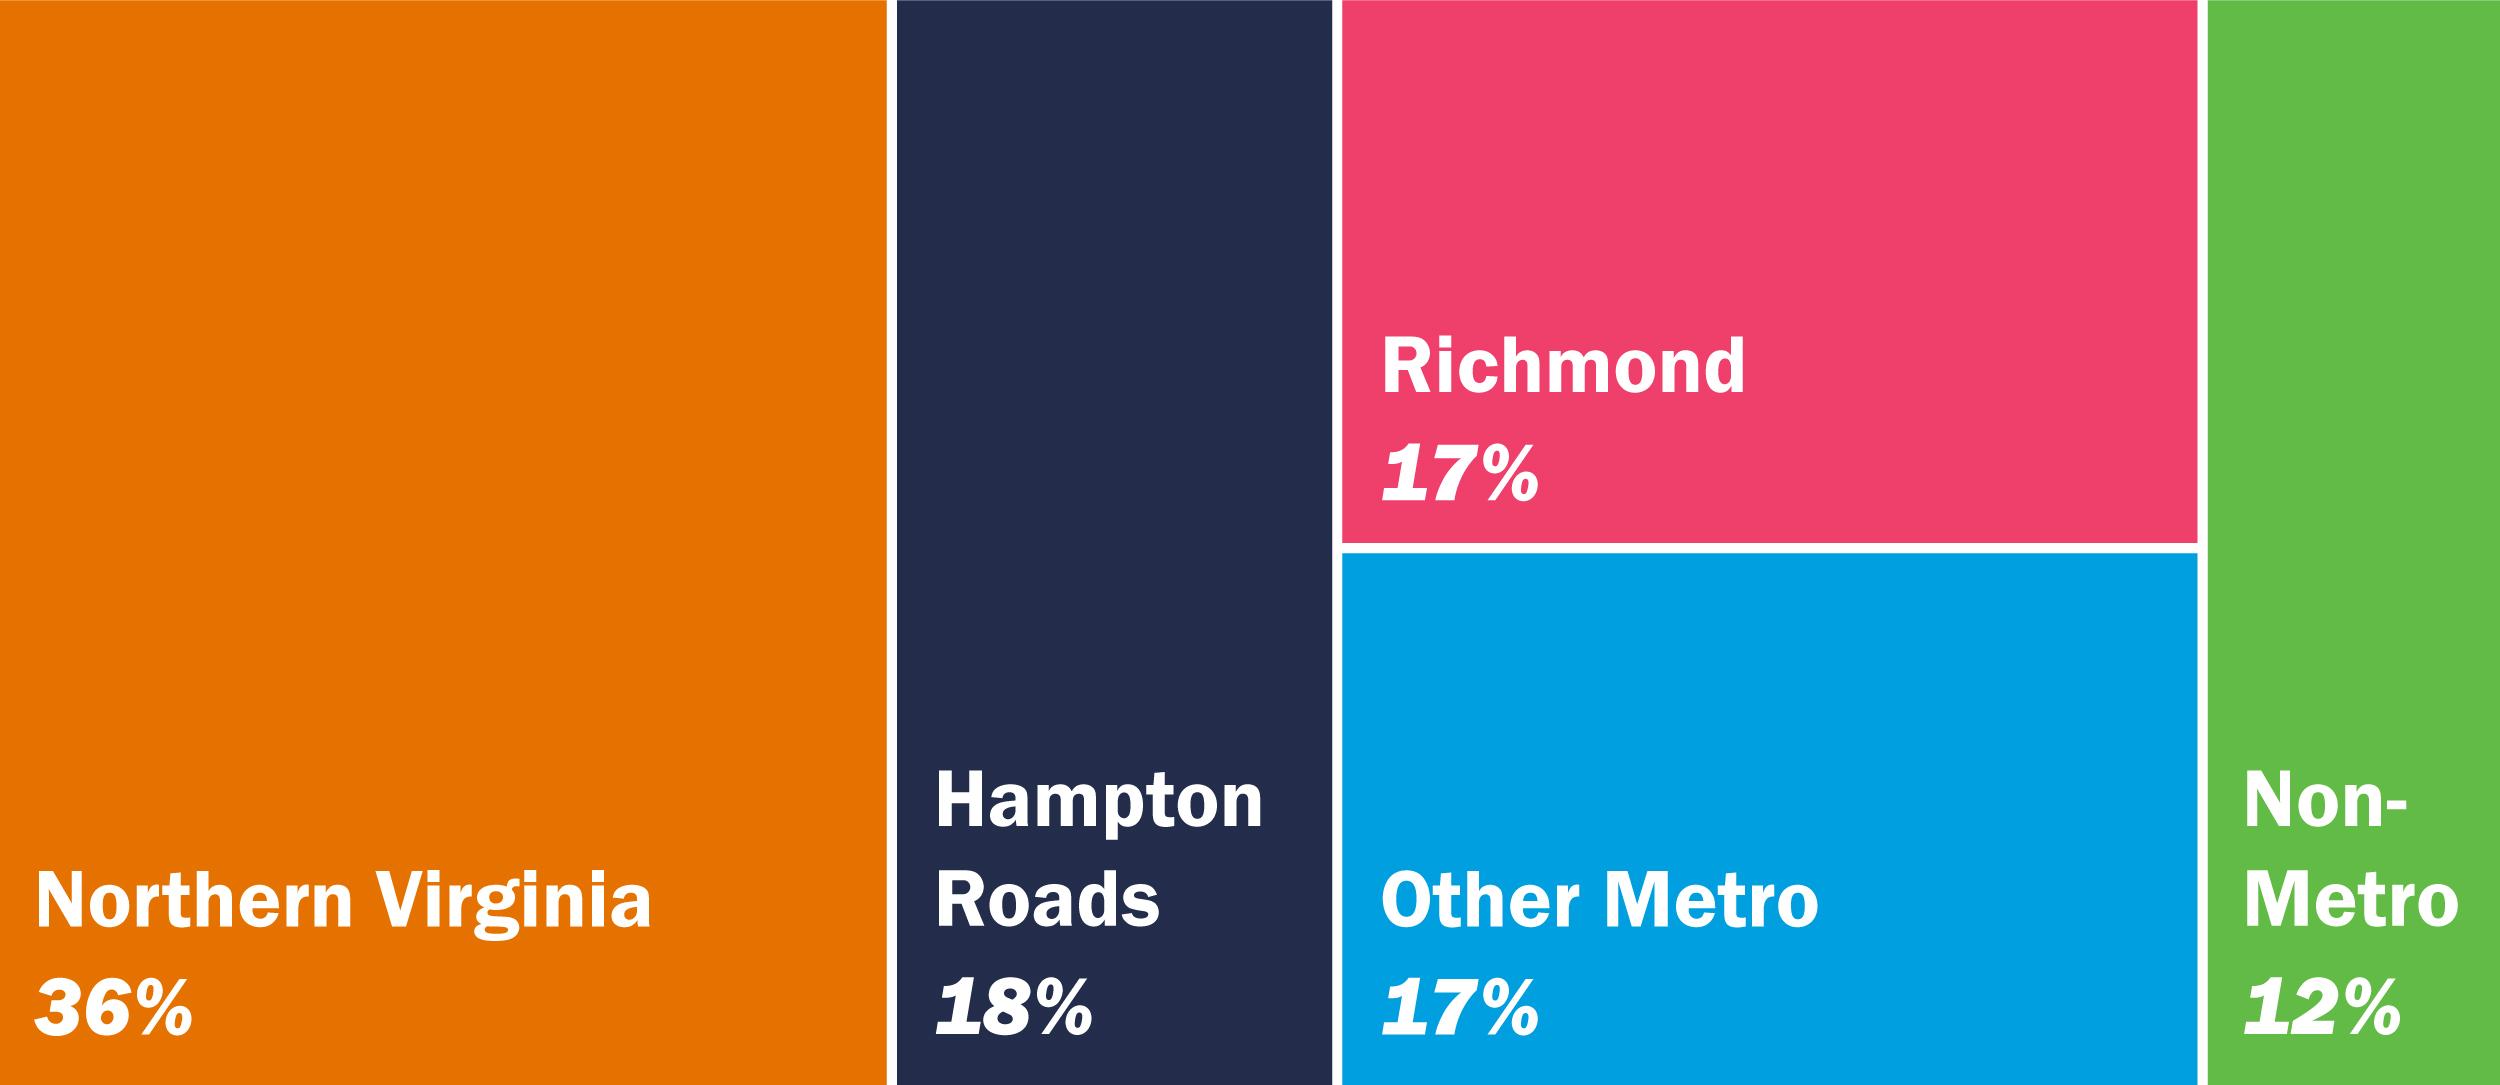 Northern Virginia 36%; Hampton Roads 18%; Richmond 17%; Other Metro 17%; Non-Metro 12%